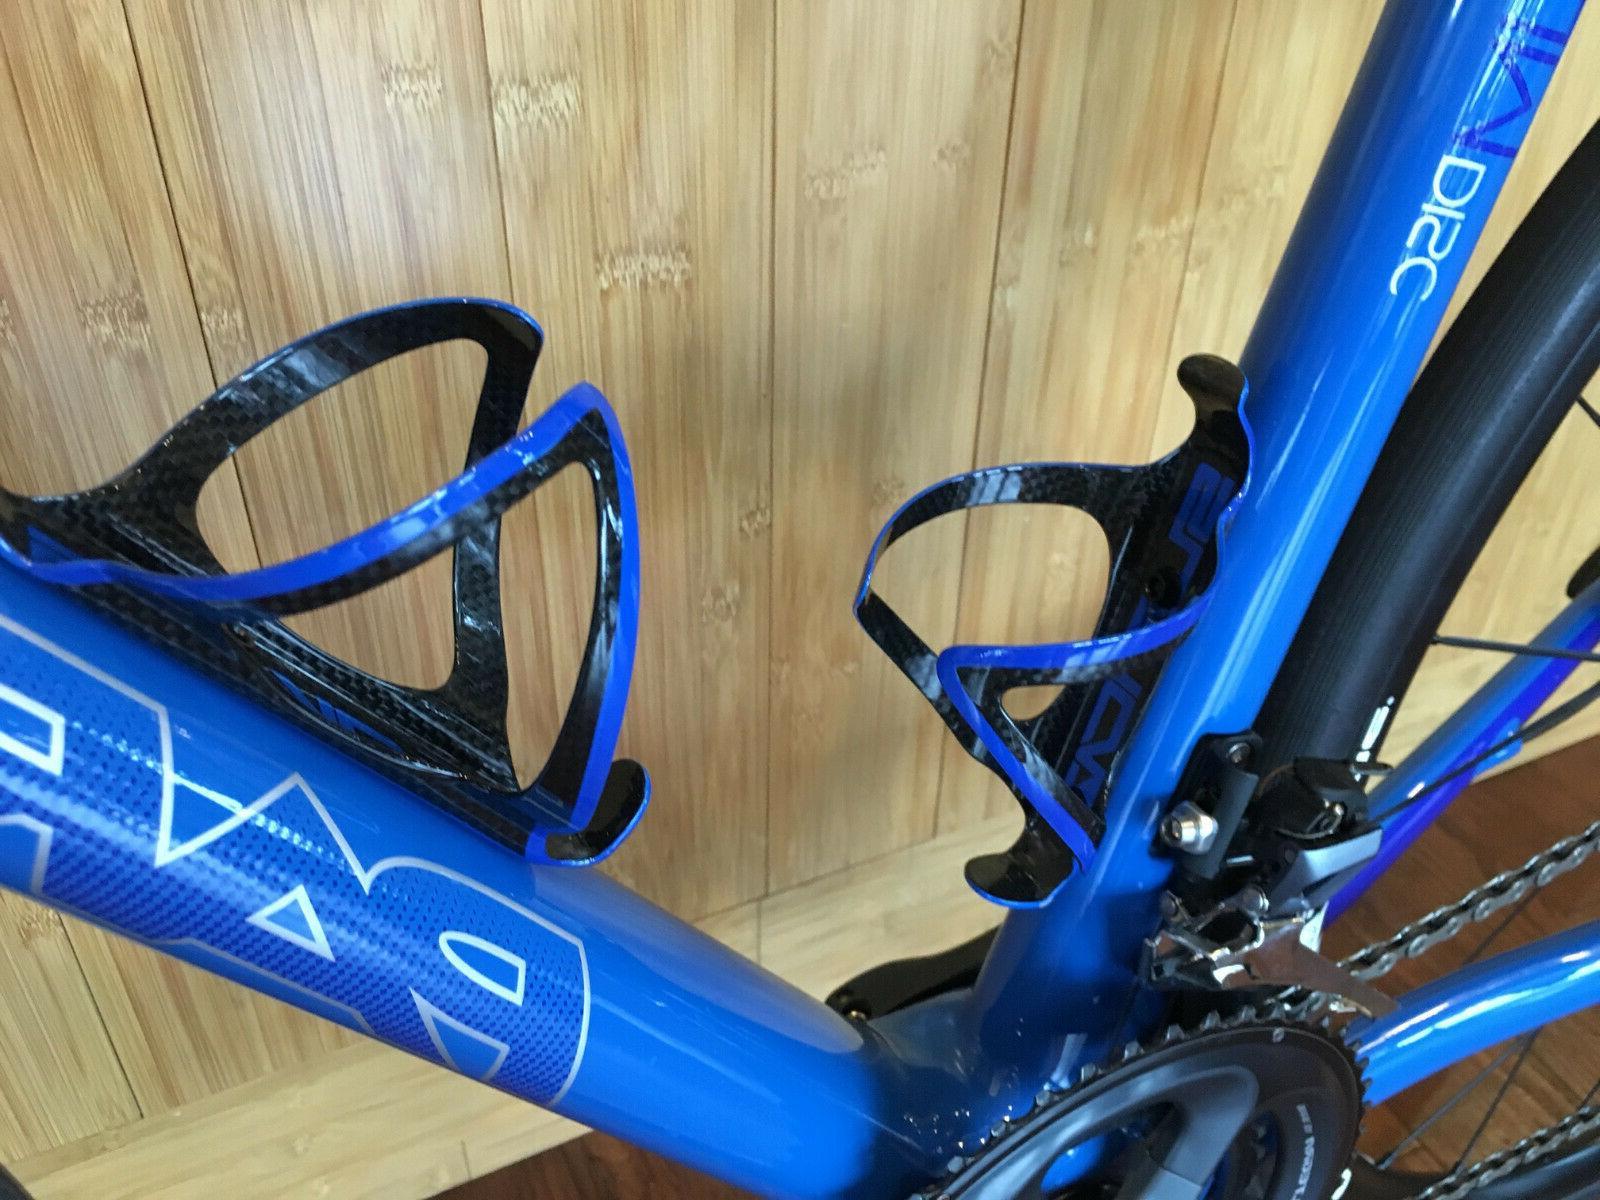 Parlee Altum Road Bike 8000 Small